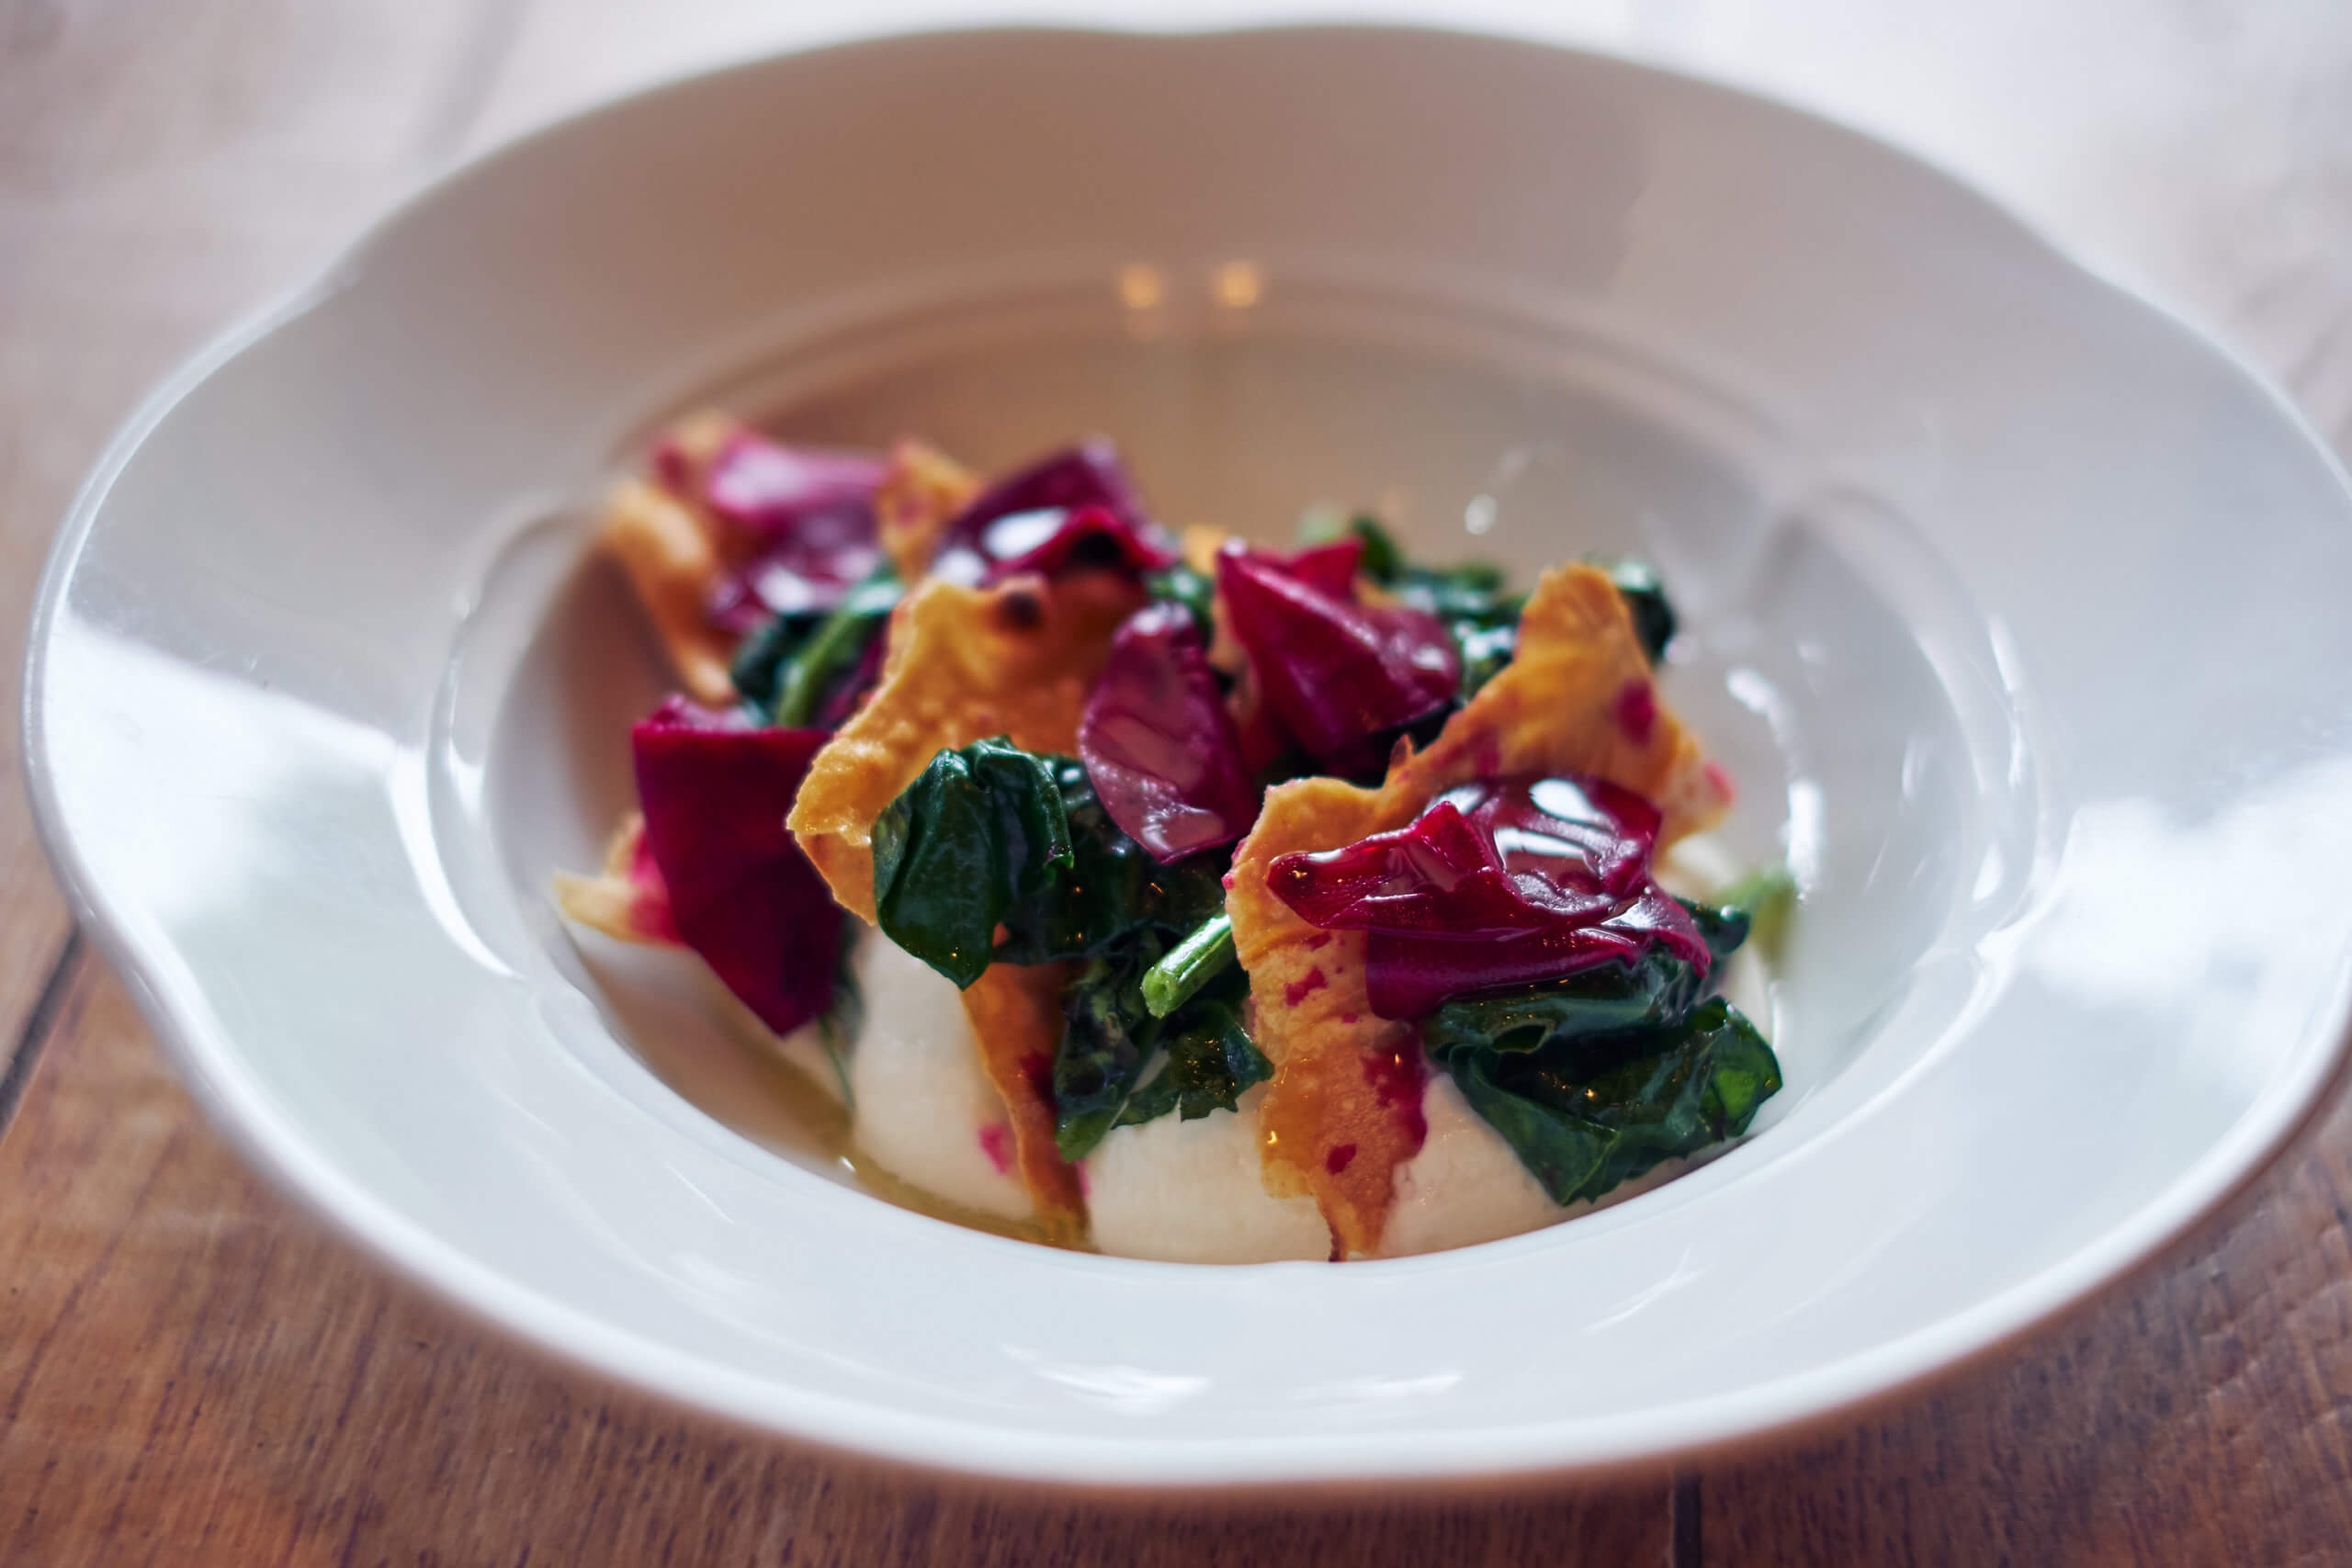 Mullixhiu, Spinach Petka Salad